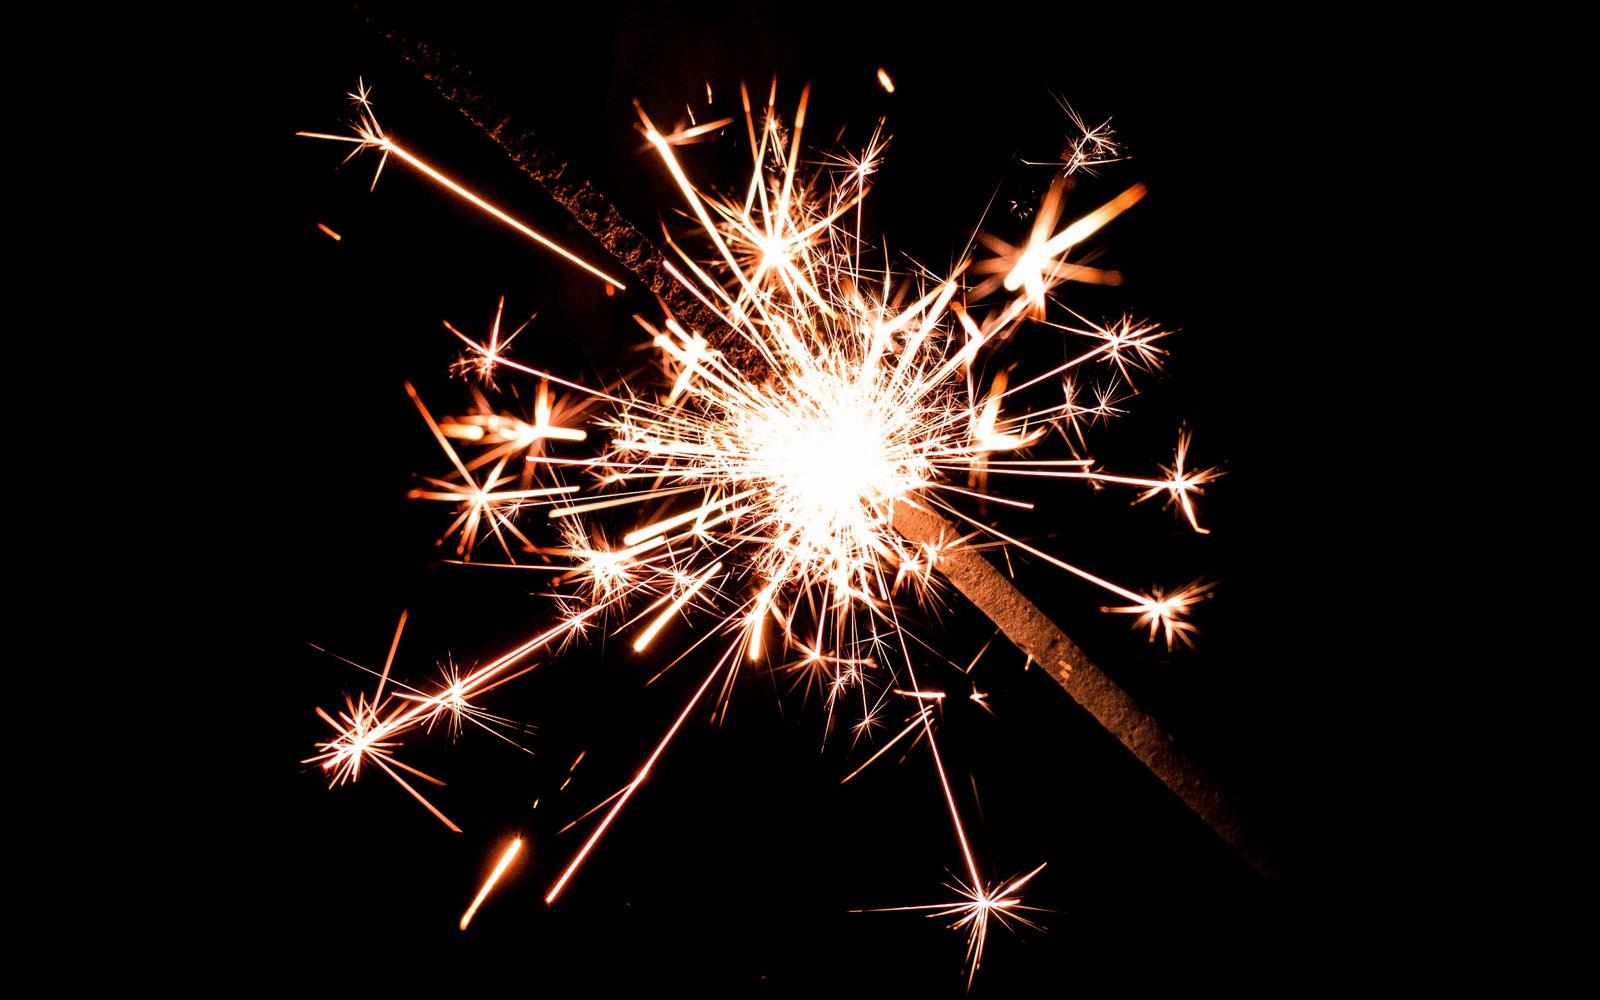 Firework spark